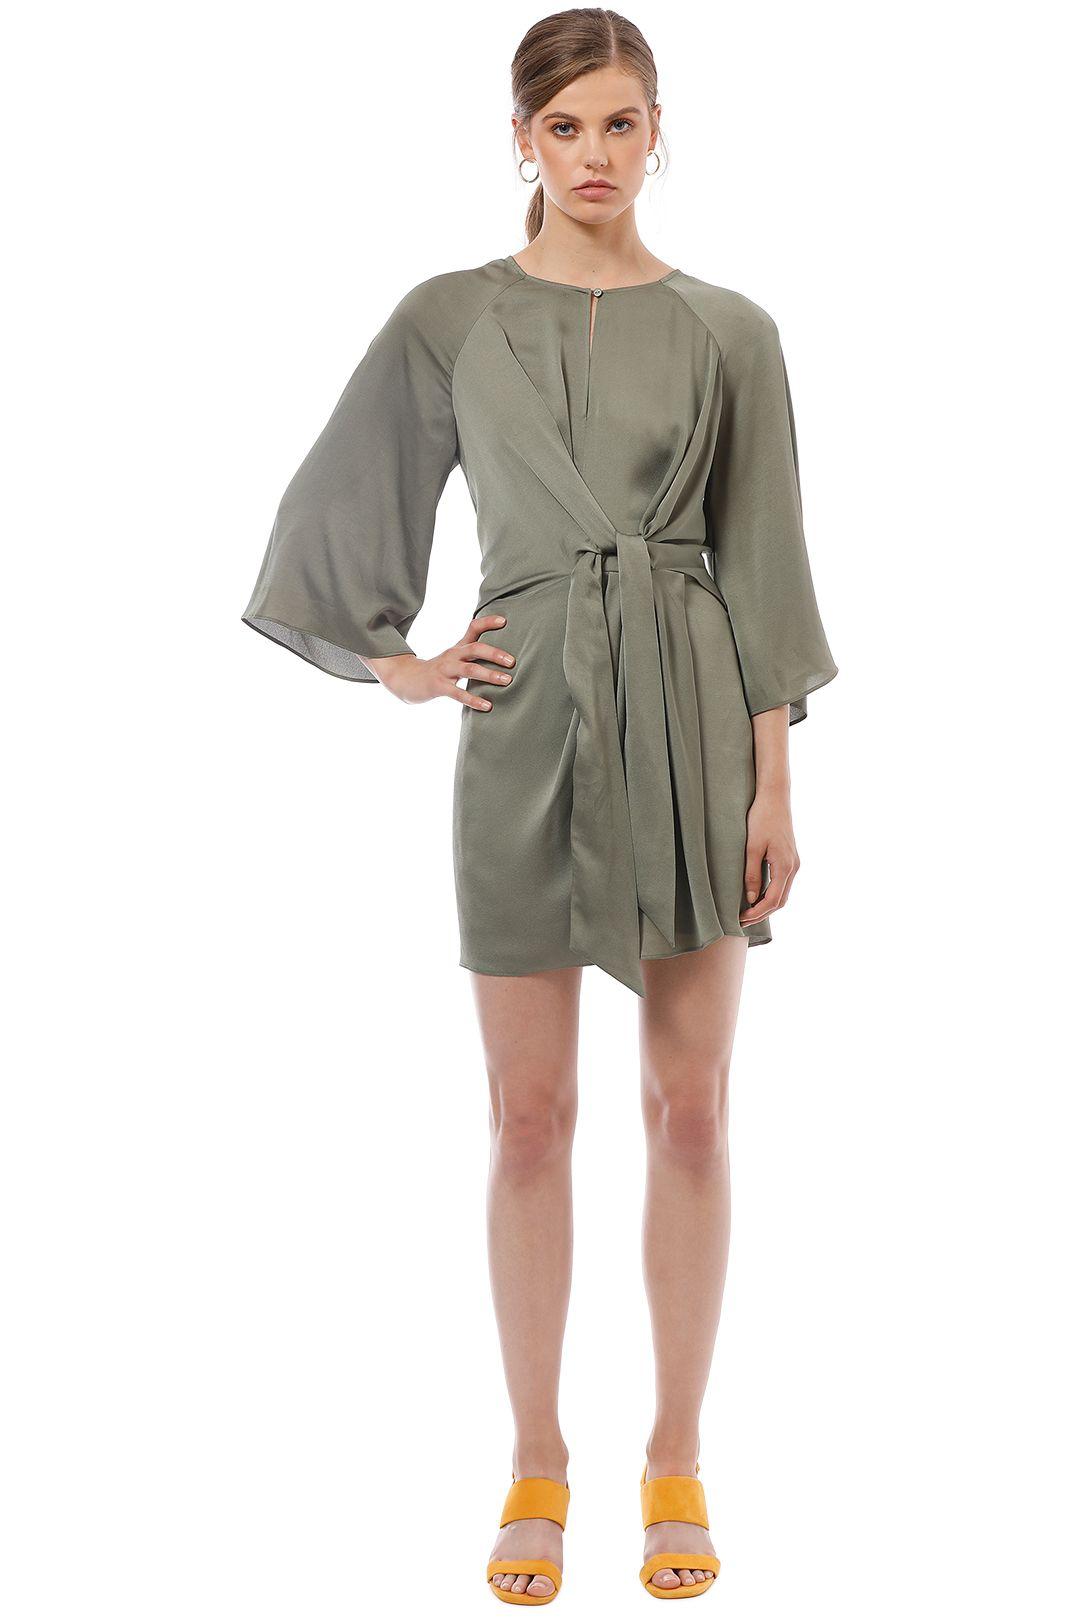 Shona Joy - Sawyer Tie Front Mini Dress - Khaki - Front